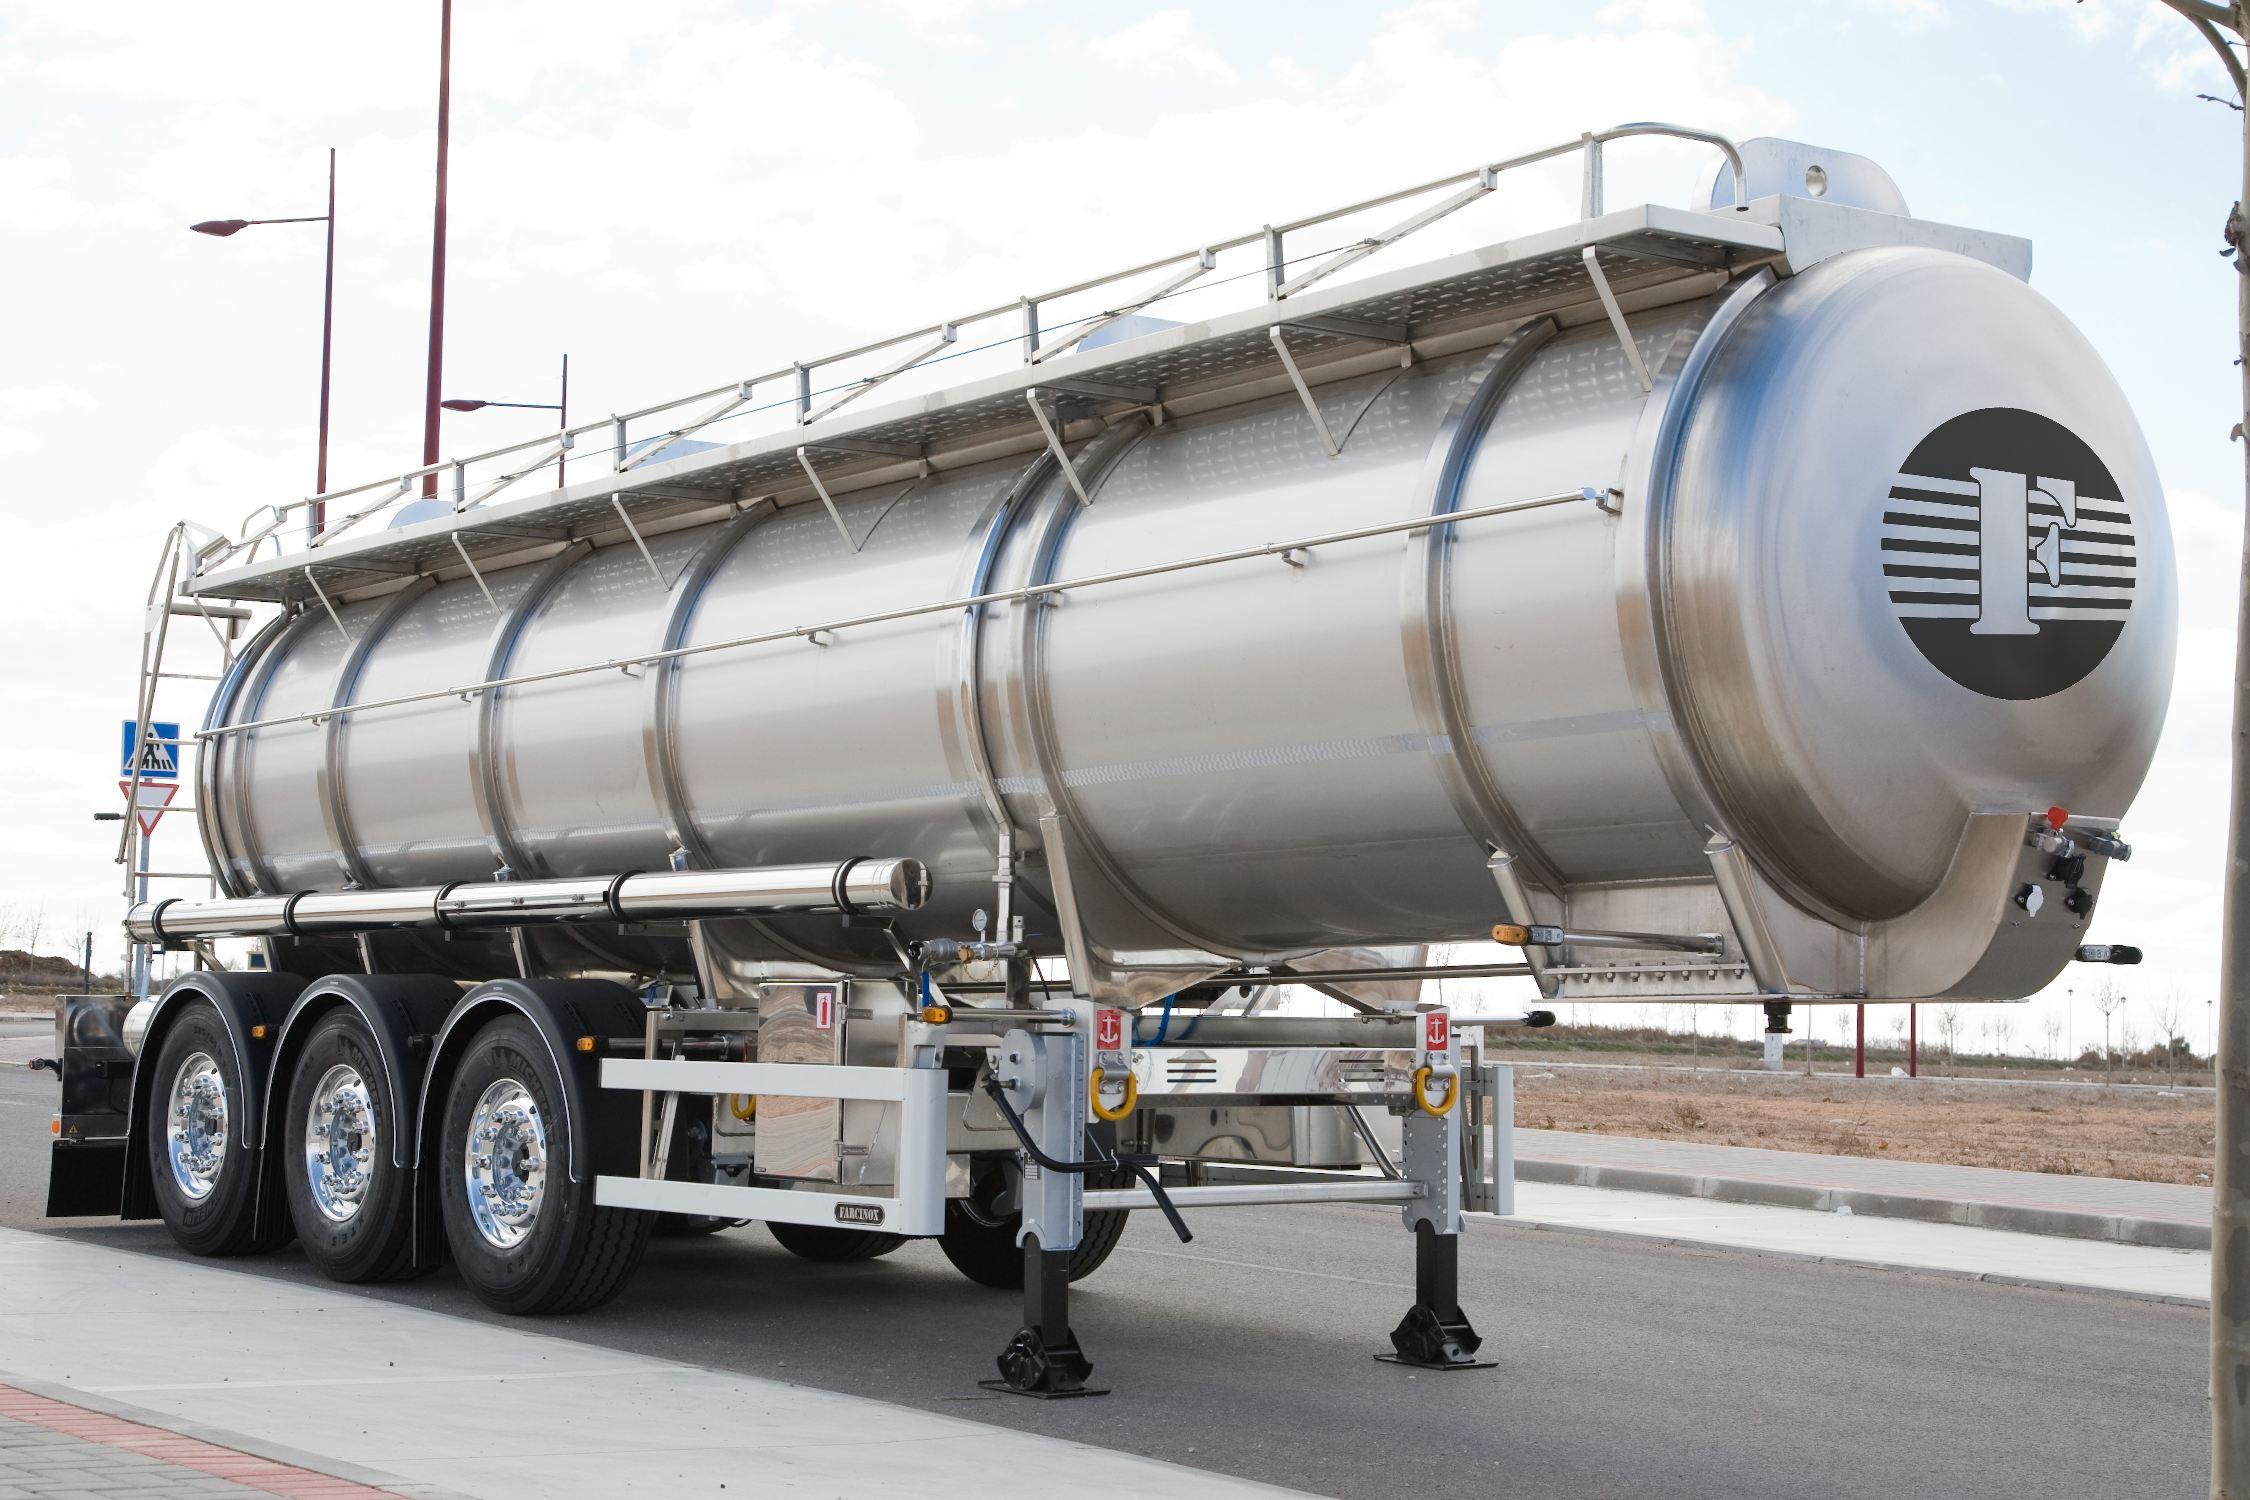 Transporte profesional de Mercancías Peligrosas (ADR): una tarea para expertos